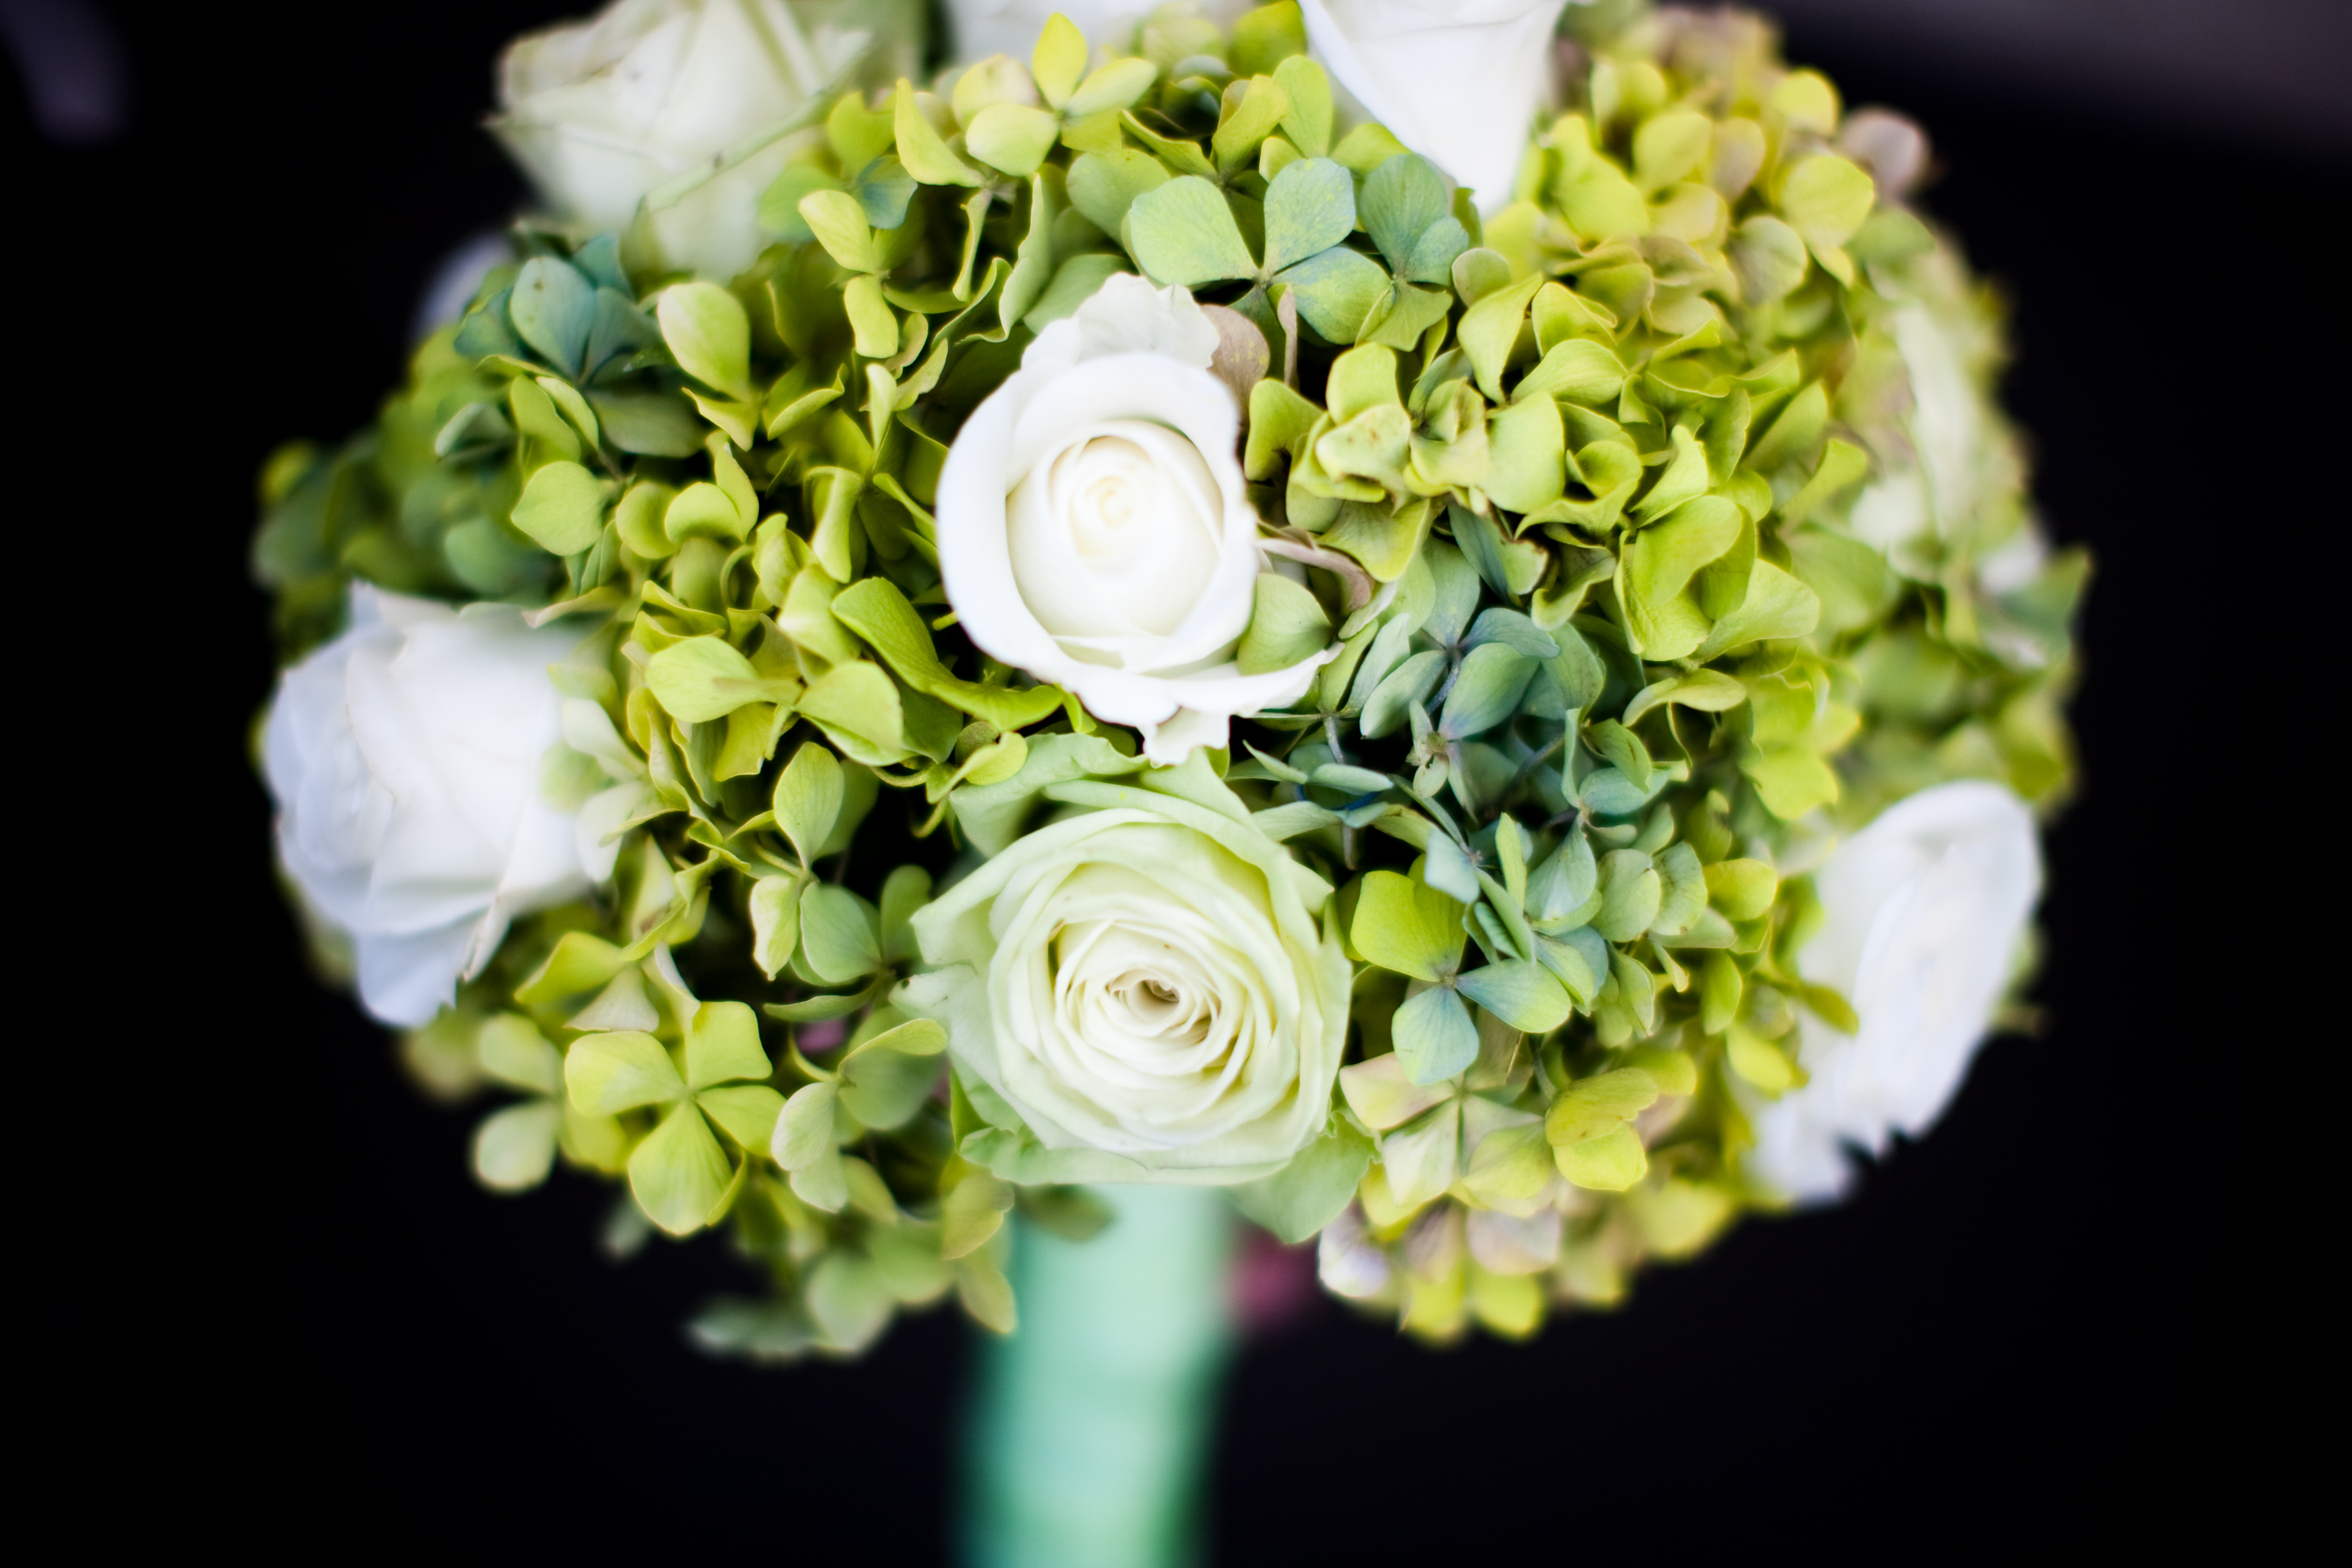 Flowers & Decor, Beach, Bride Bouquets, Flowers, Beach Wedding Flowers & Decor, Bouquet, Bridal, Brides, Long, California, Sara jordan photography